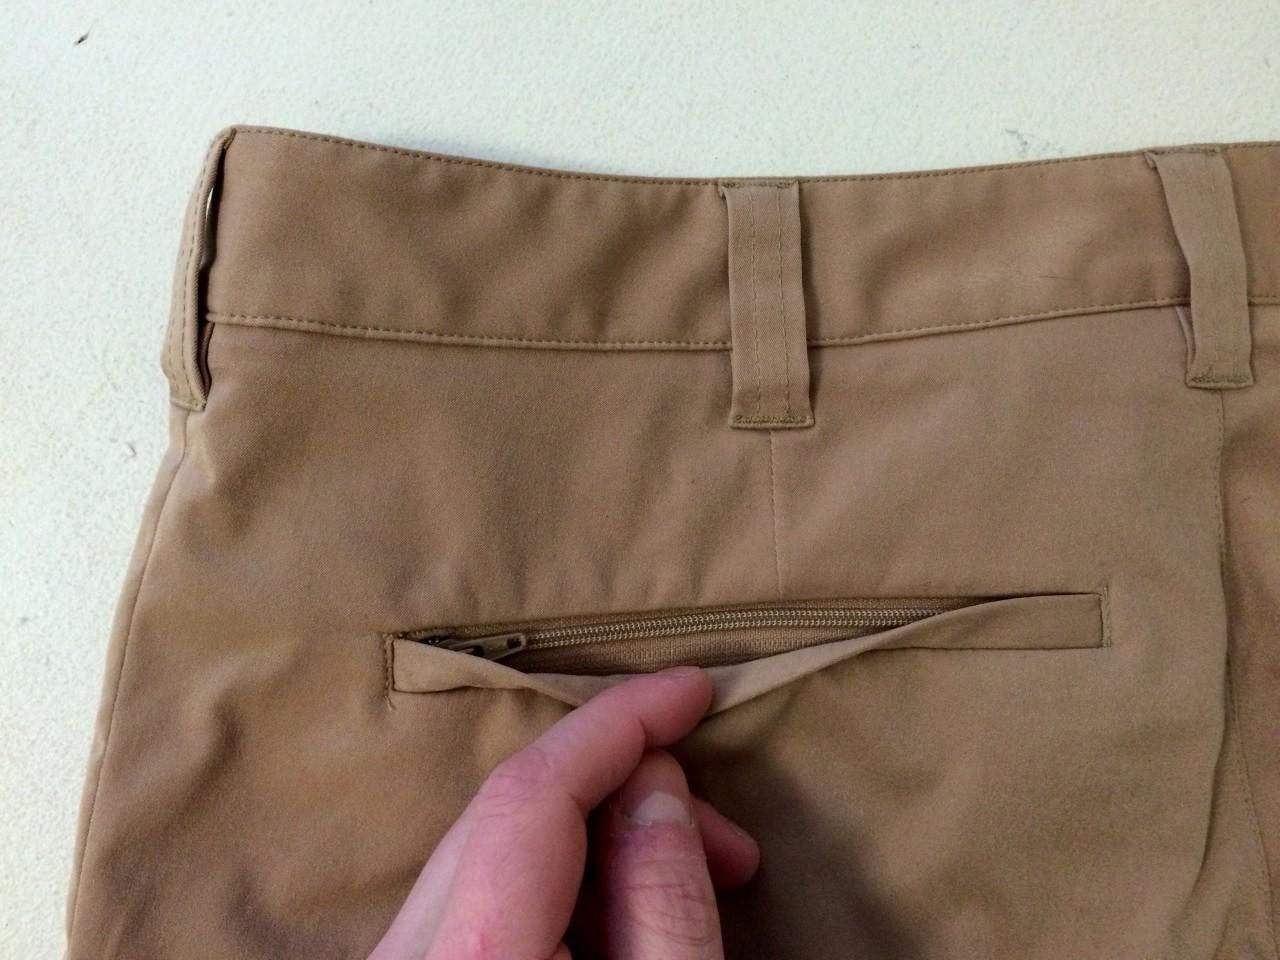 Bluffworks Chino Back Left Pocket